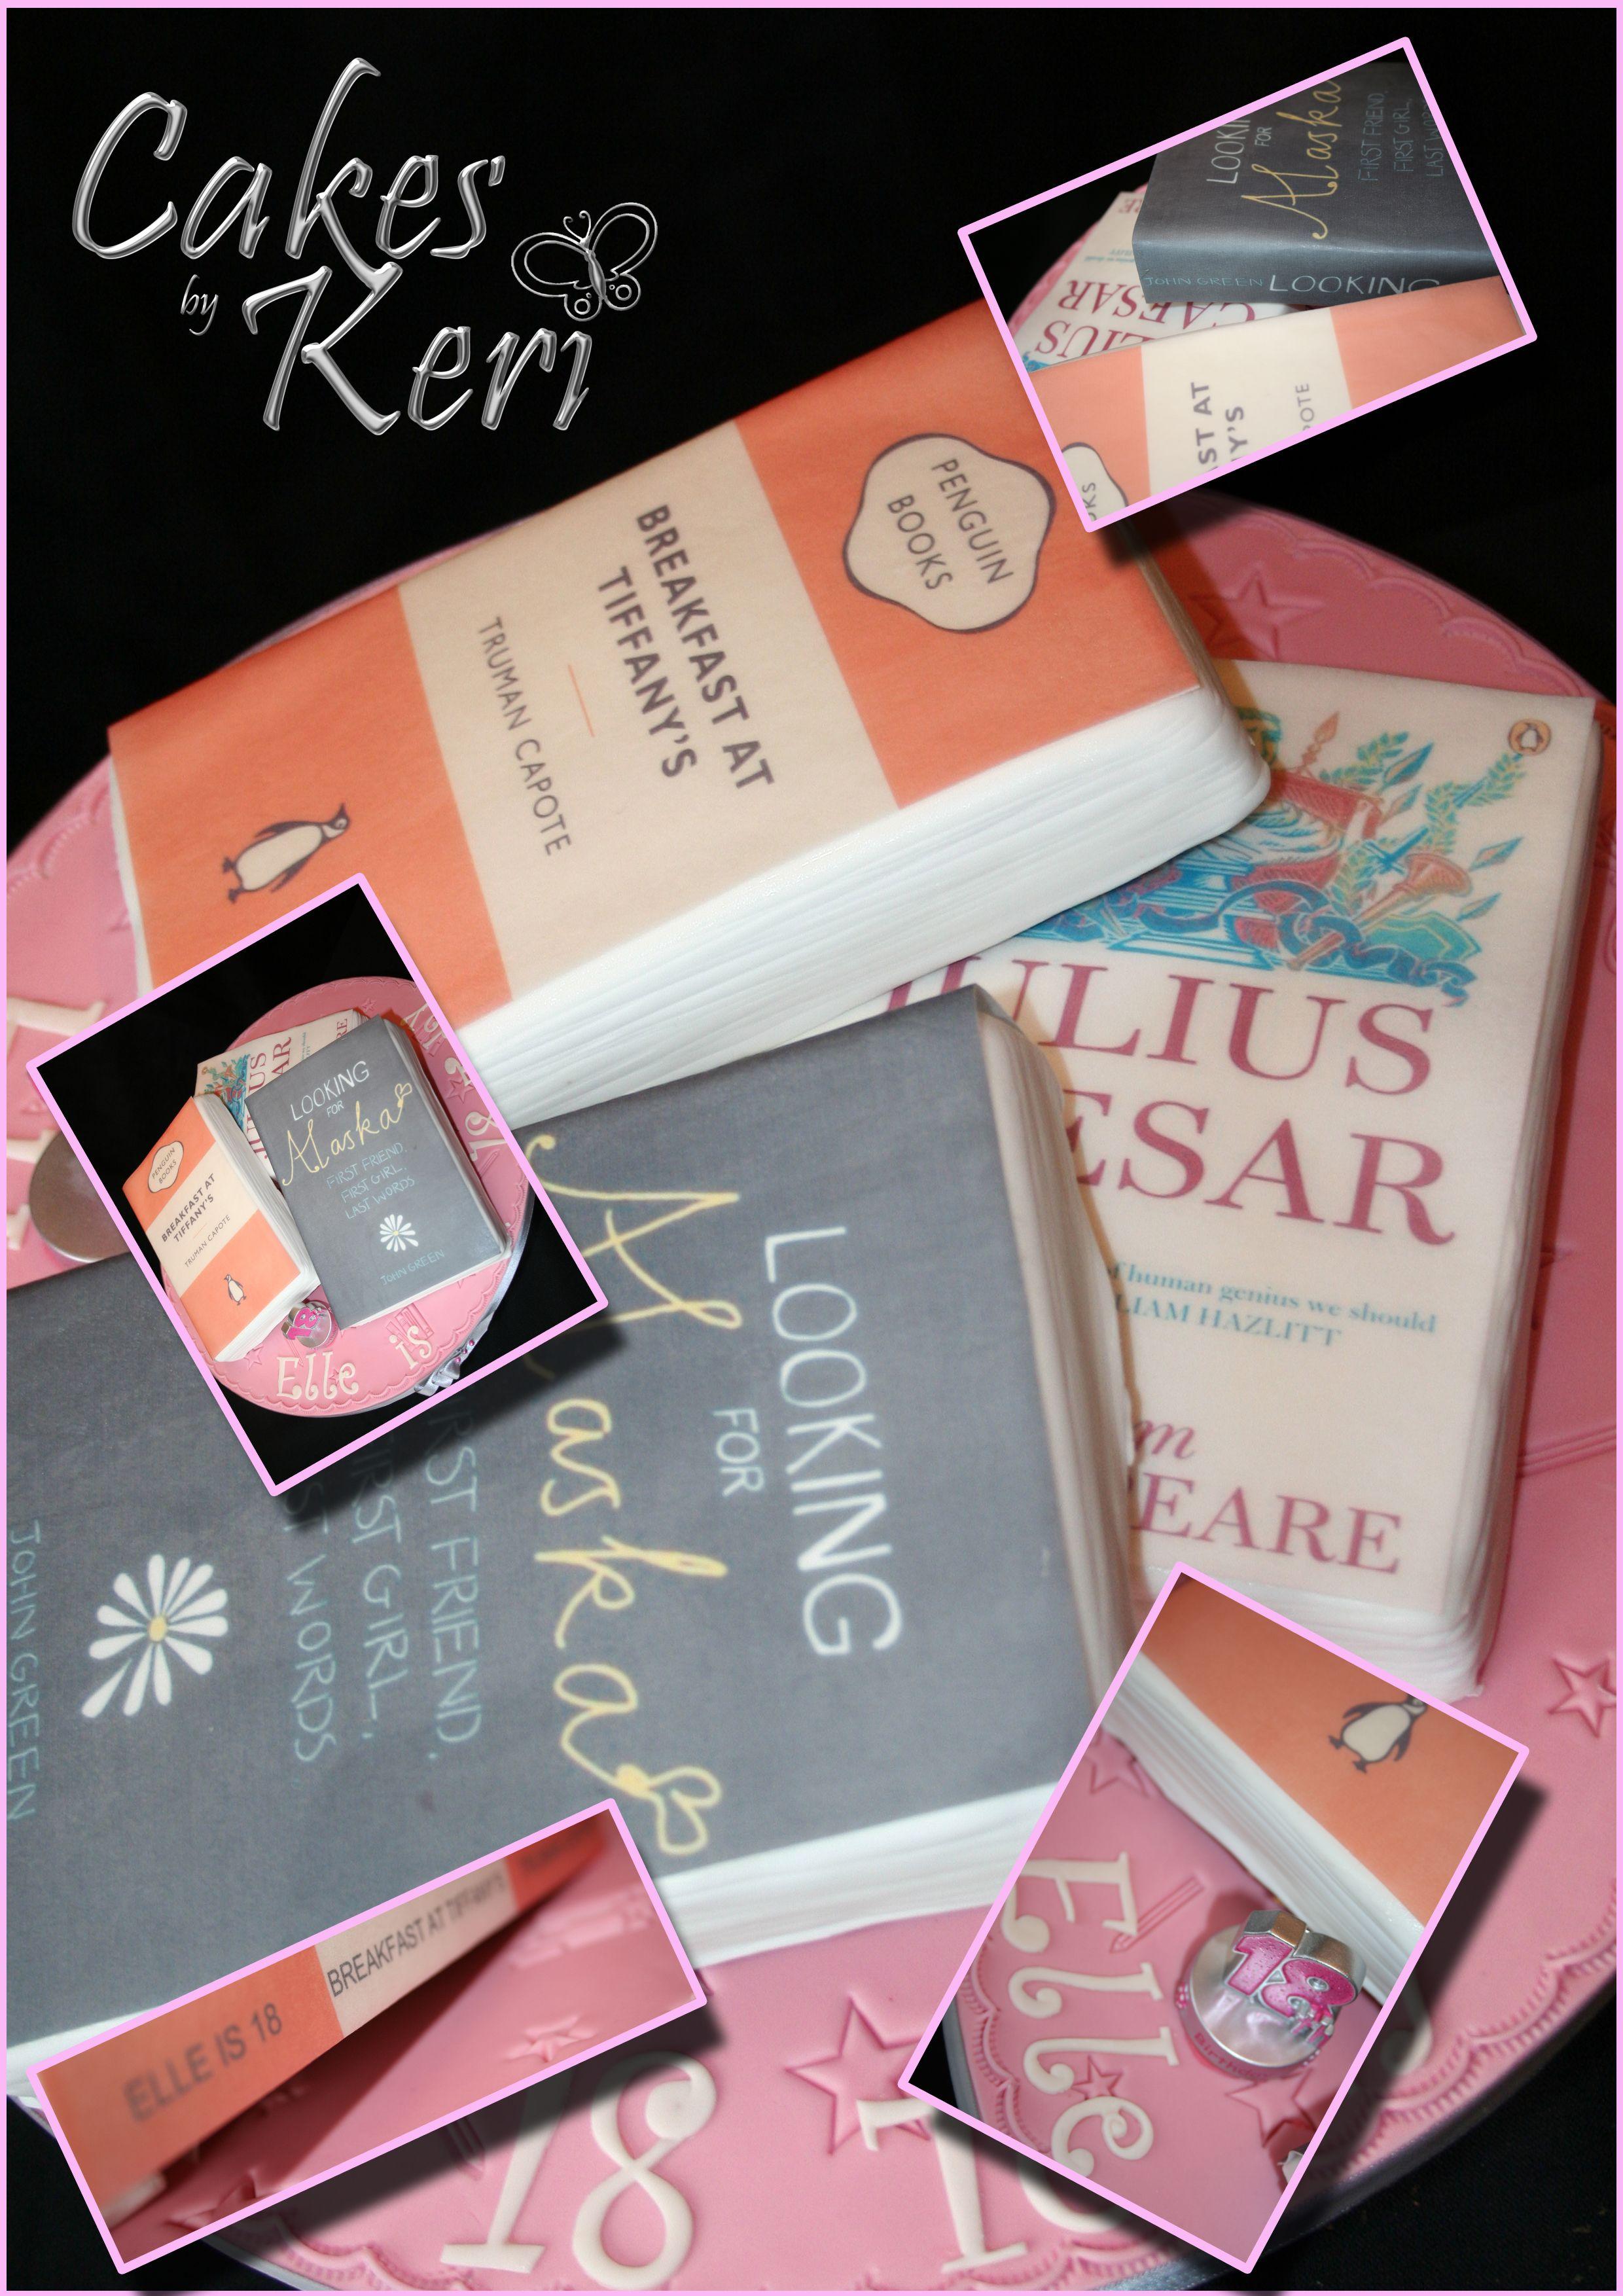 Vanilla Sponge, Fondant icing with edible book covers